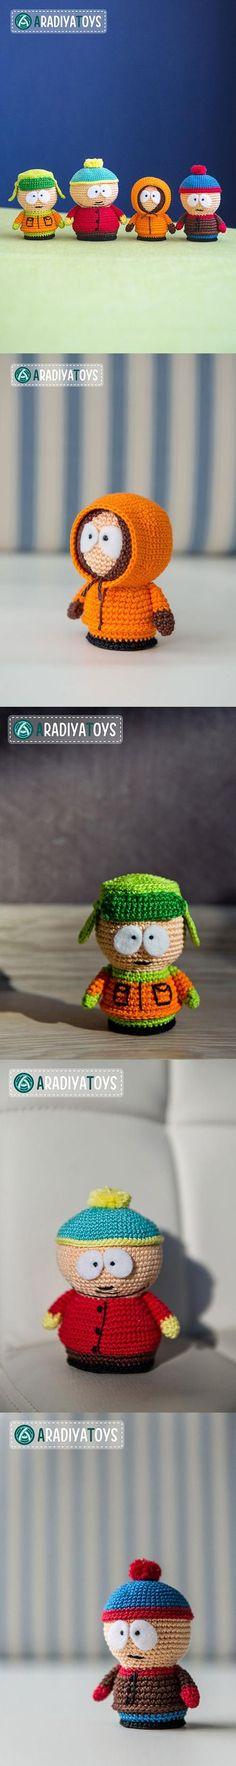 South Park amigurumis patterns :)